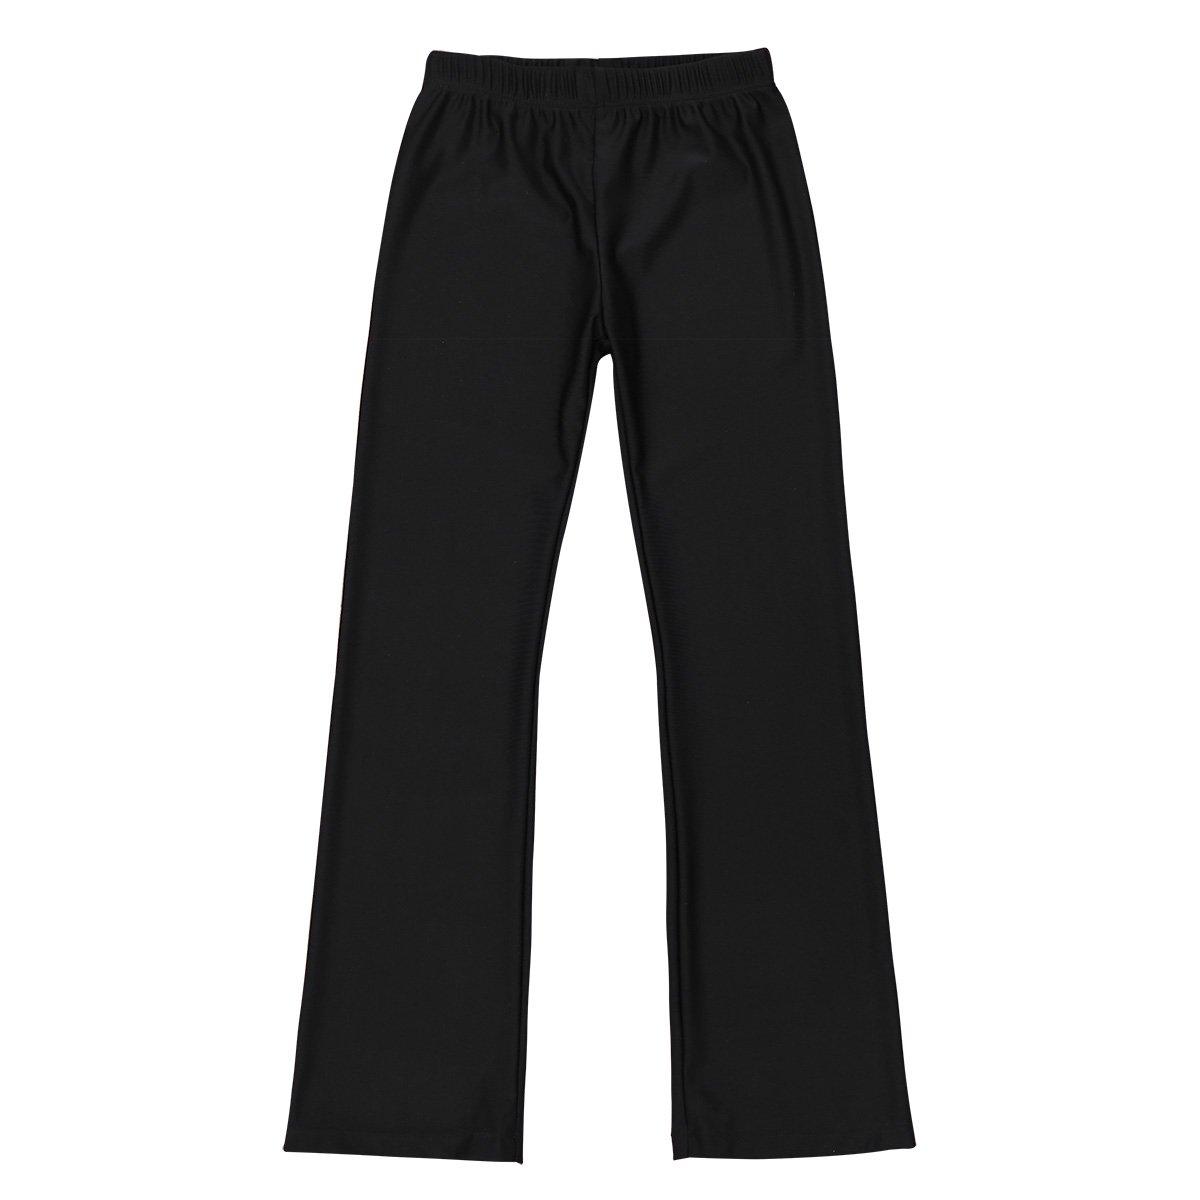 MSemis Kids Girls Stretchy Loose Classic Jazz Yoga Pants Dancewear Trousers